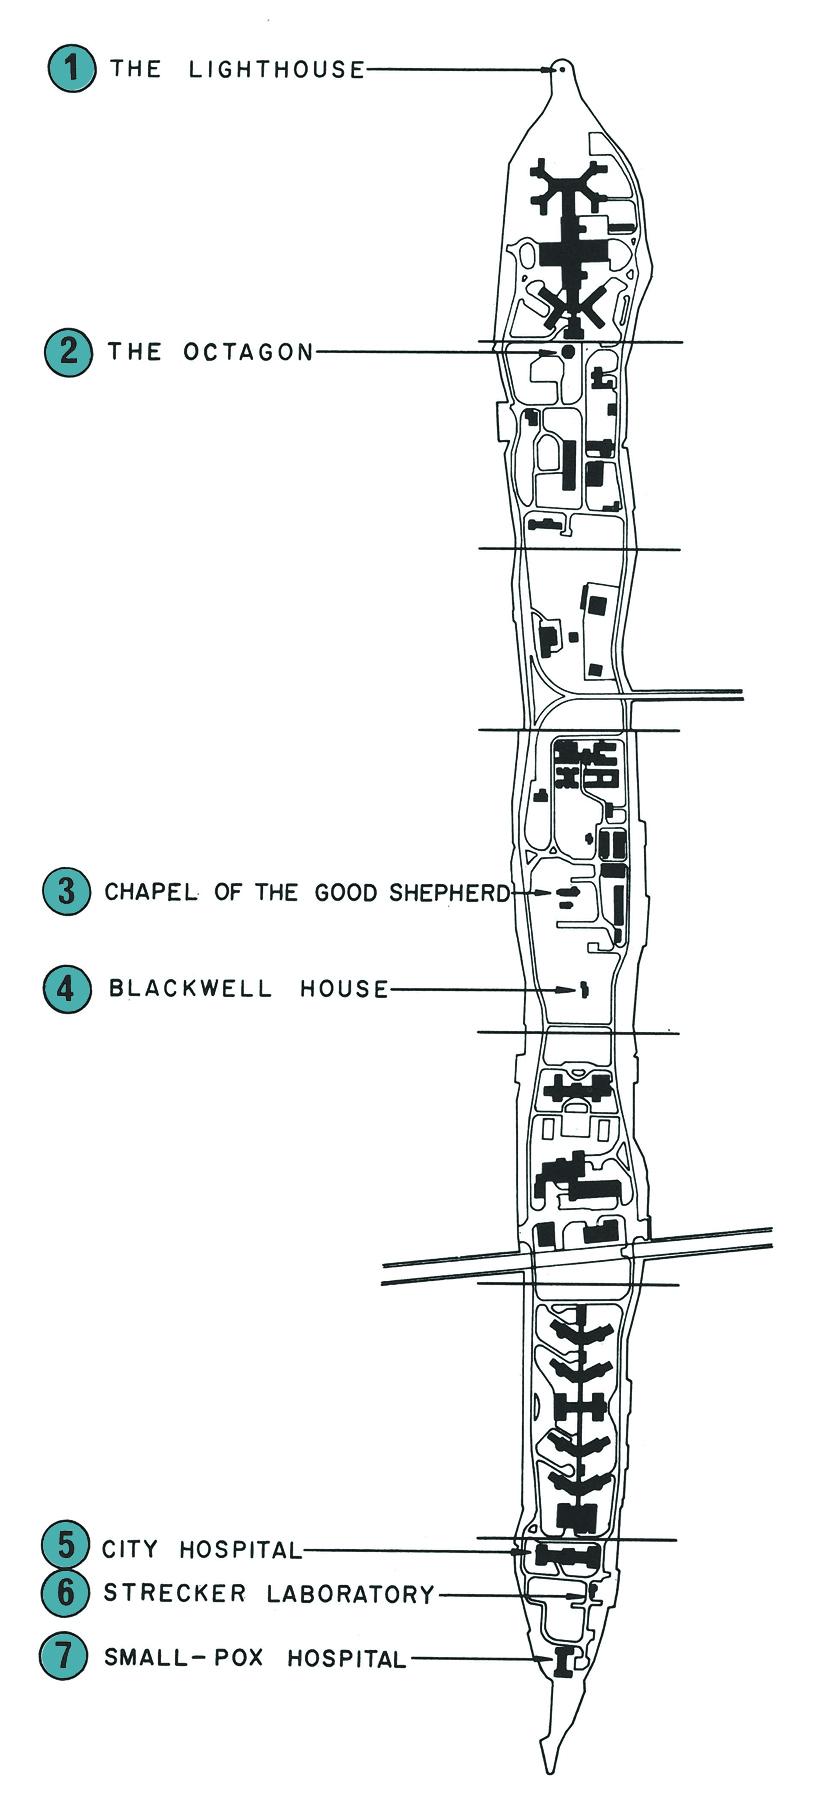 Map drawn by Cavaglieri,  Protection of Landmark Buildings